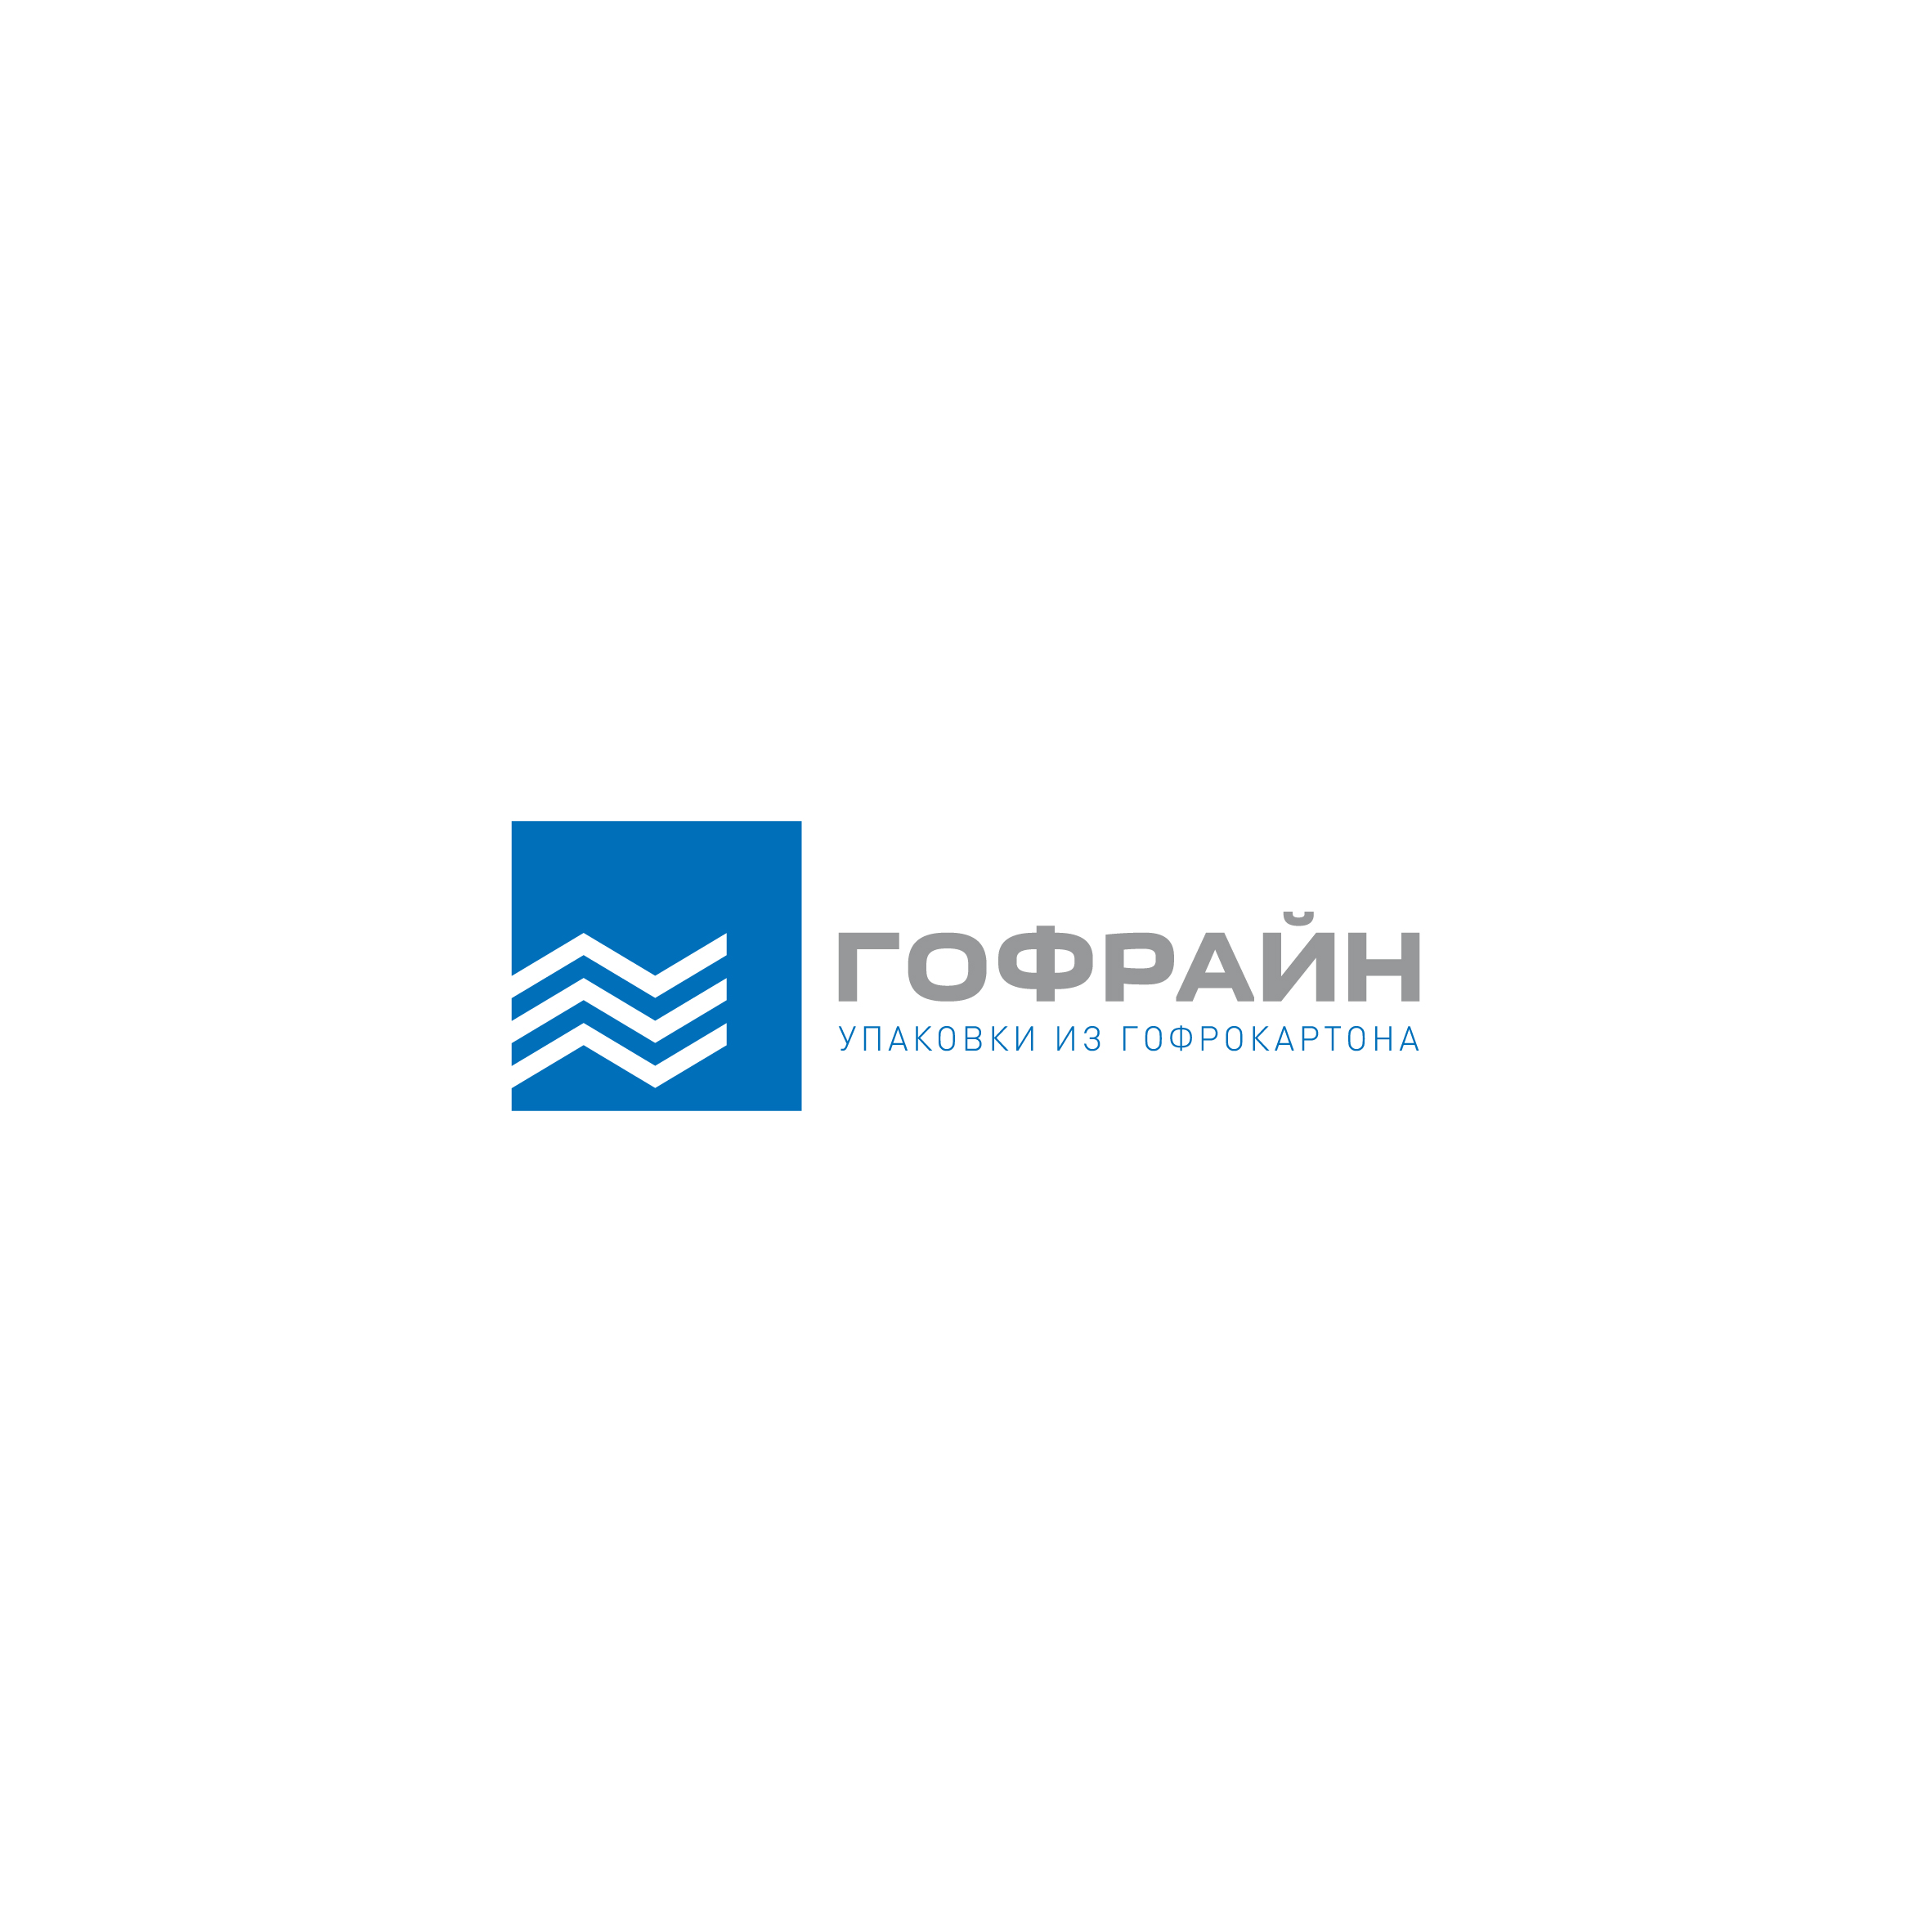 Логотип для компании по реализации упаковки из гофрокартона фото f_1435cde741583887.jpg